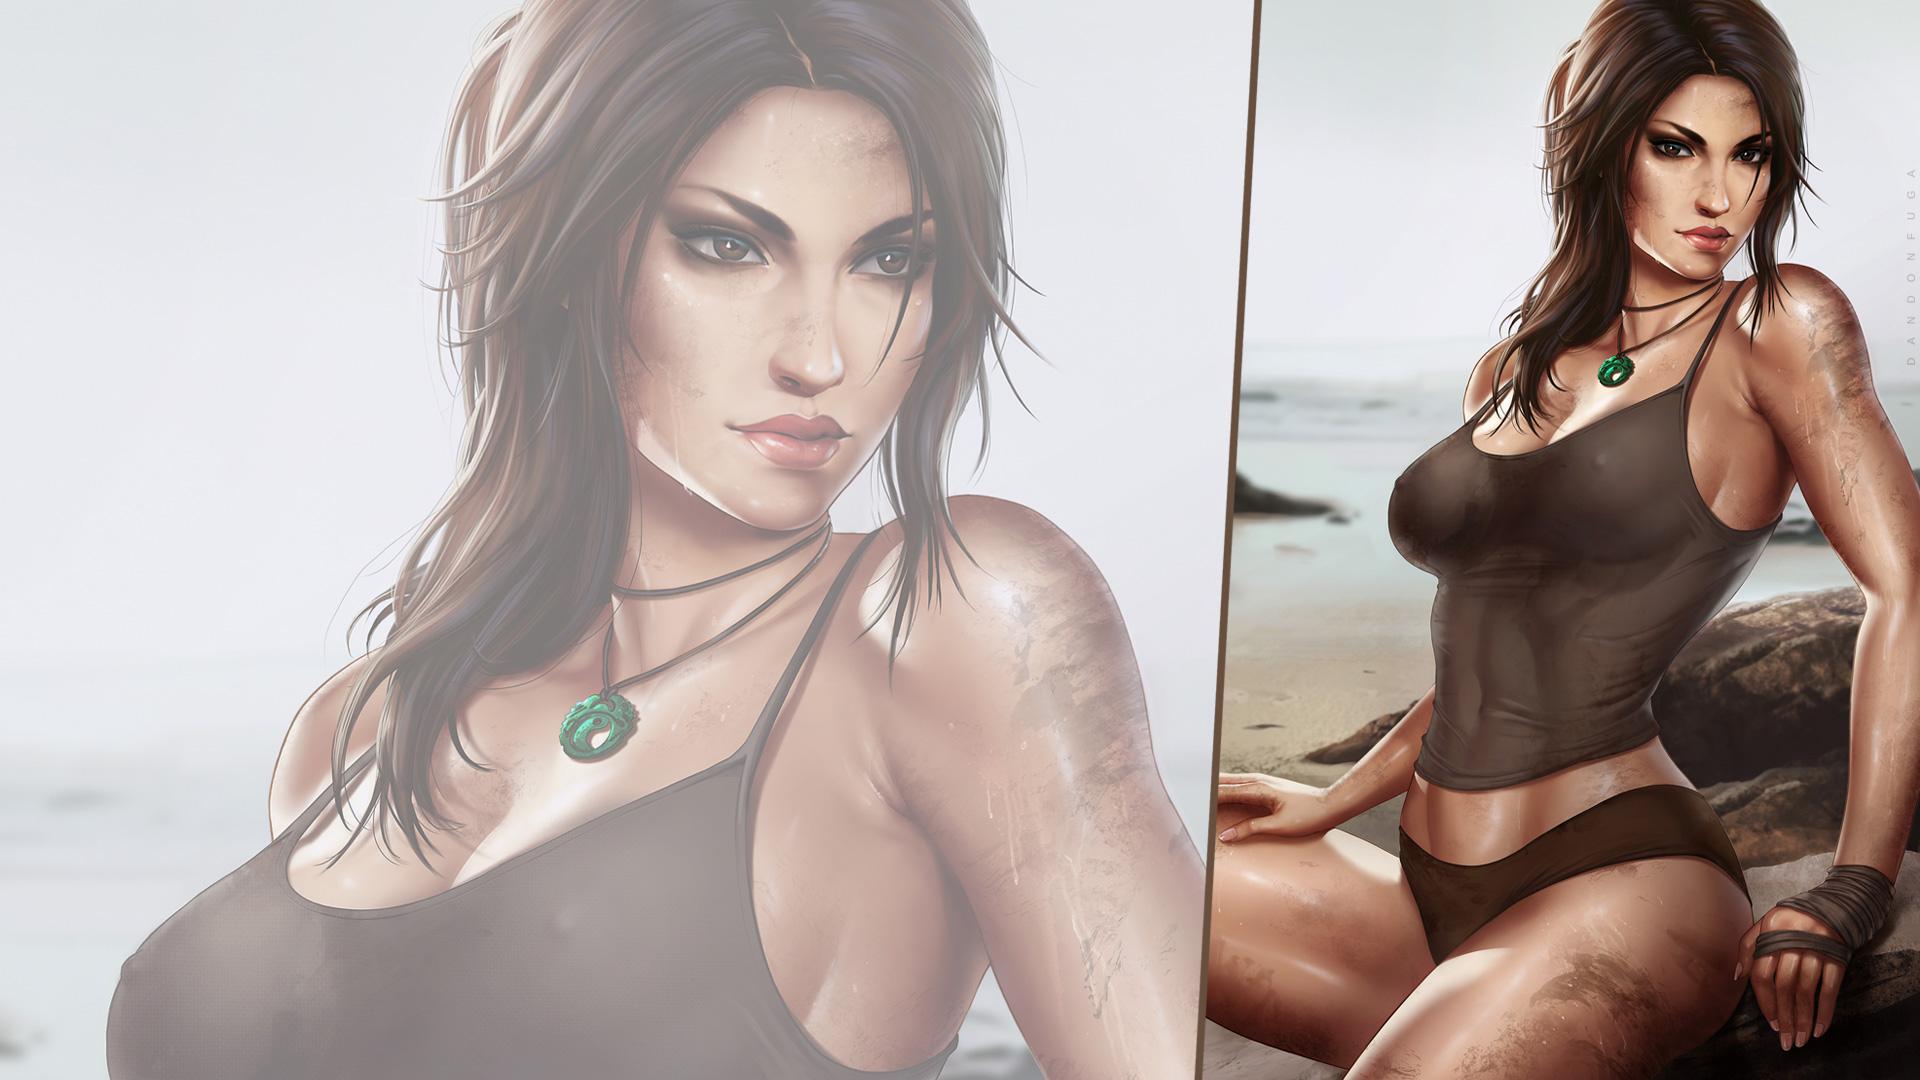 General 1920x1080 dandon fuga Lara Croft Tomb Raider looking at viewer brunette